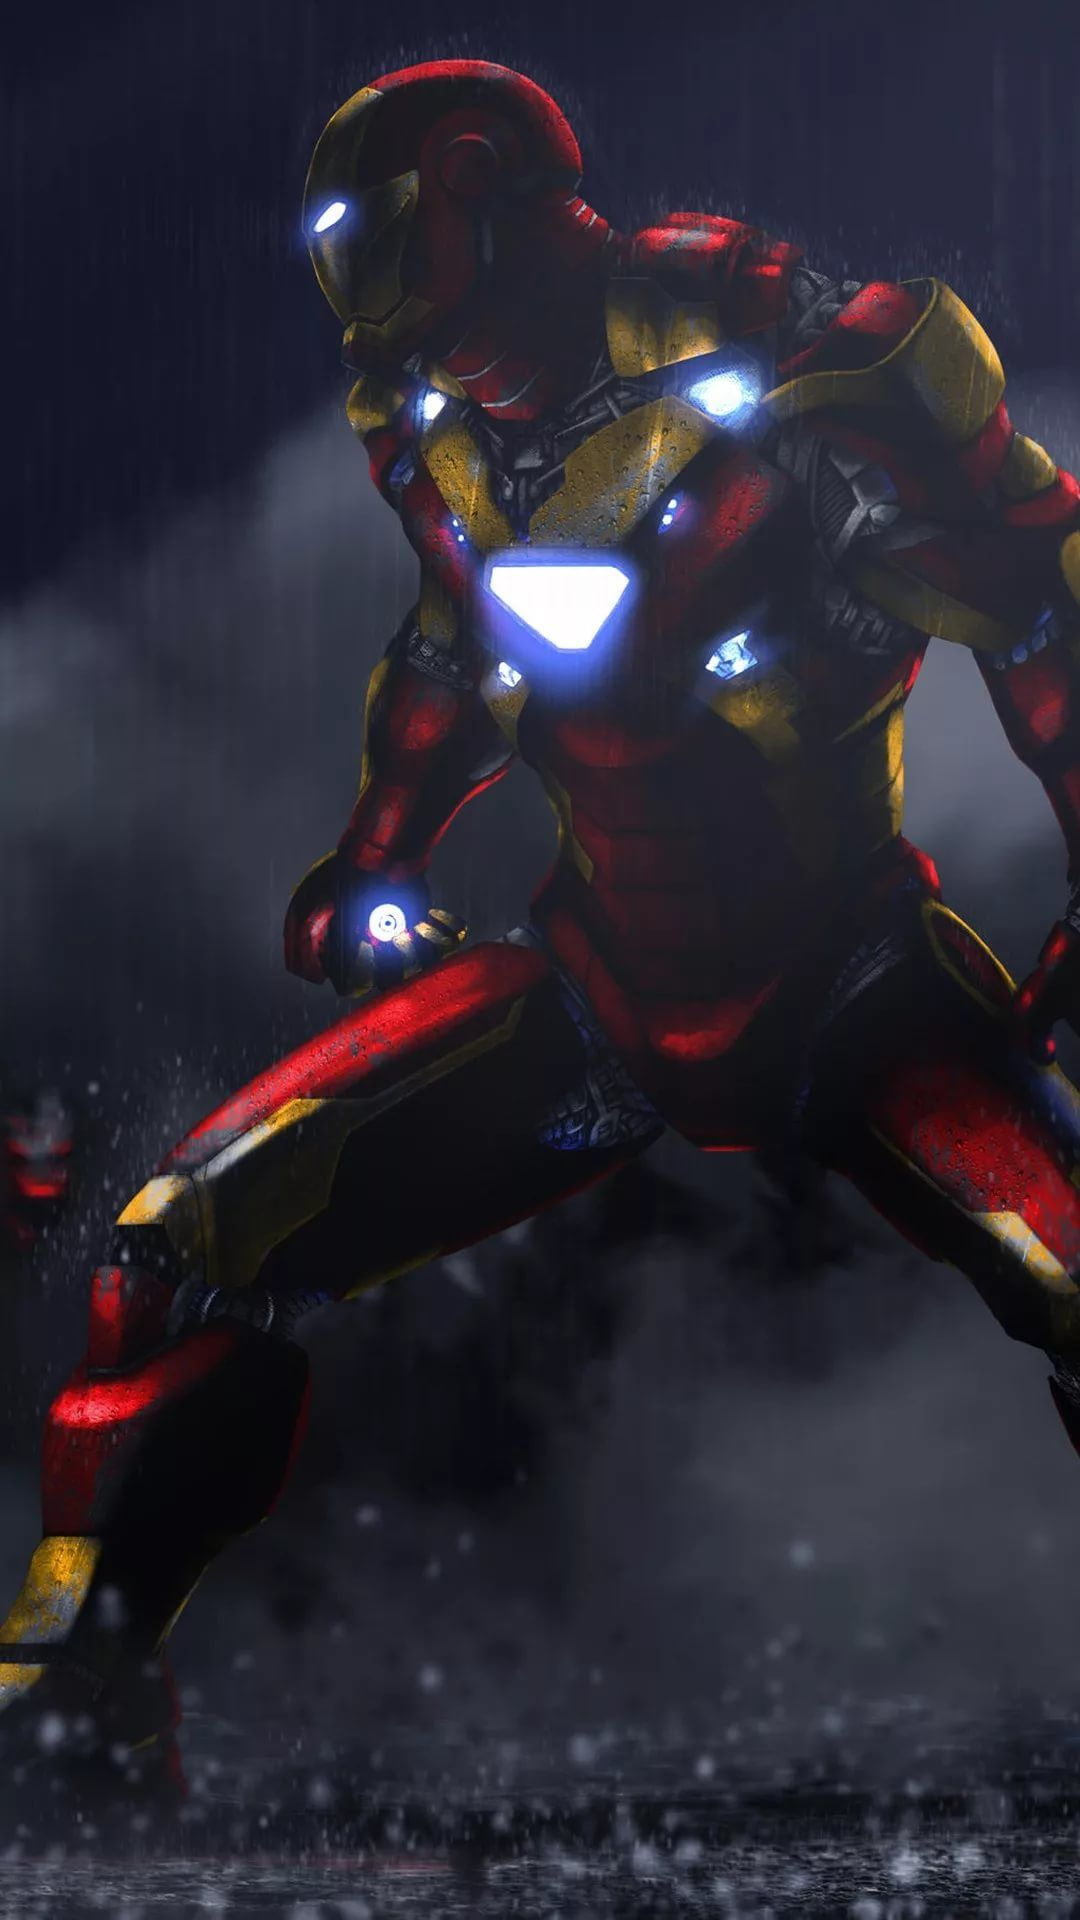 Iron Man D iPhone x wallpaper